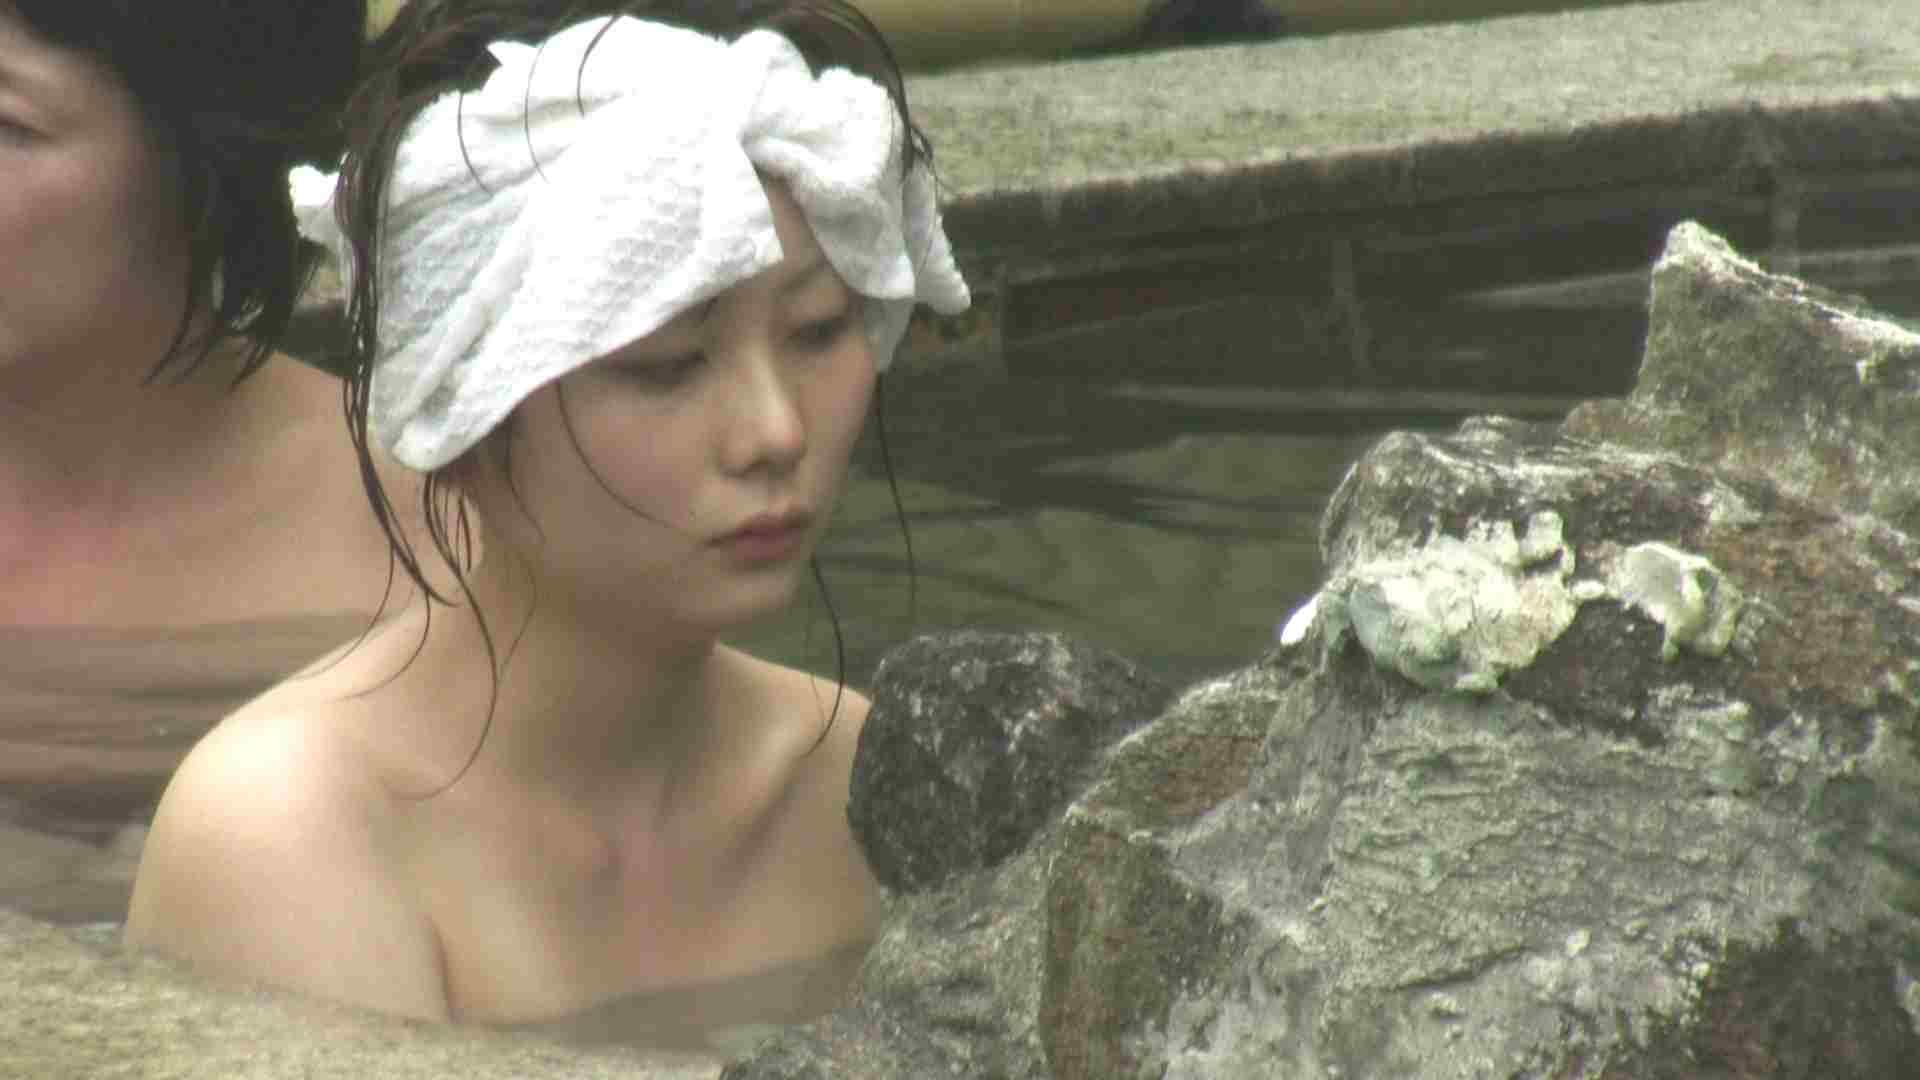 Aquaな露天風呂Vol.147 綺麗なOLたち アダルト動画キャプチャ 102枚 14